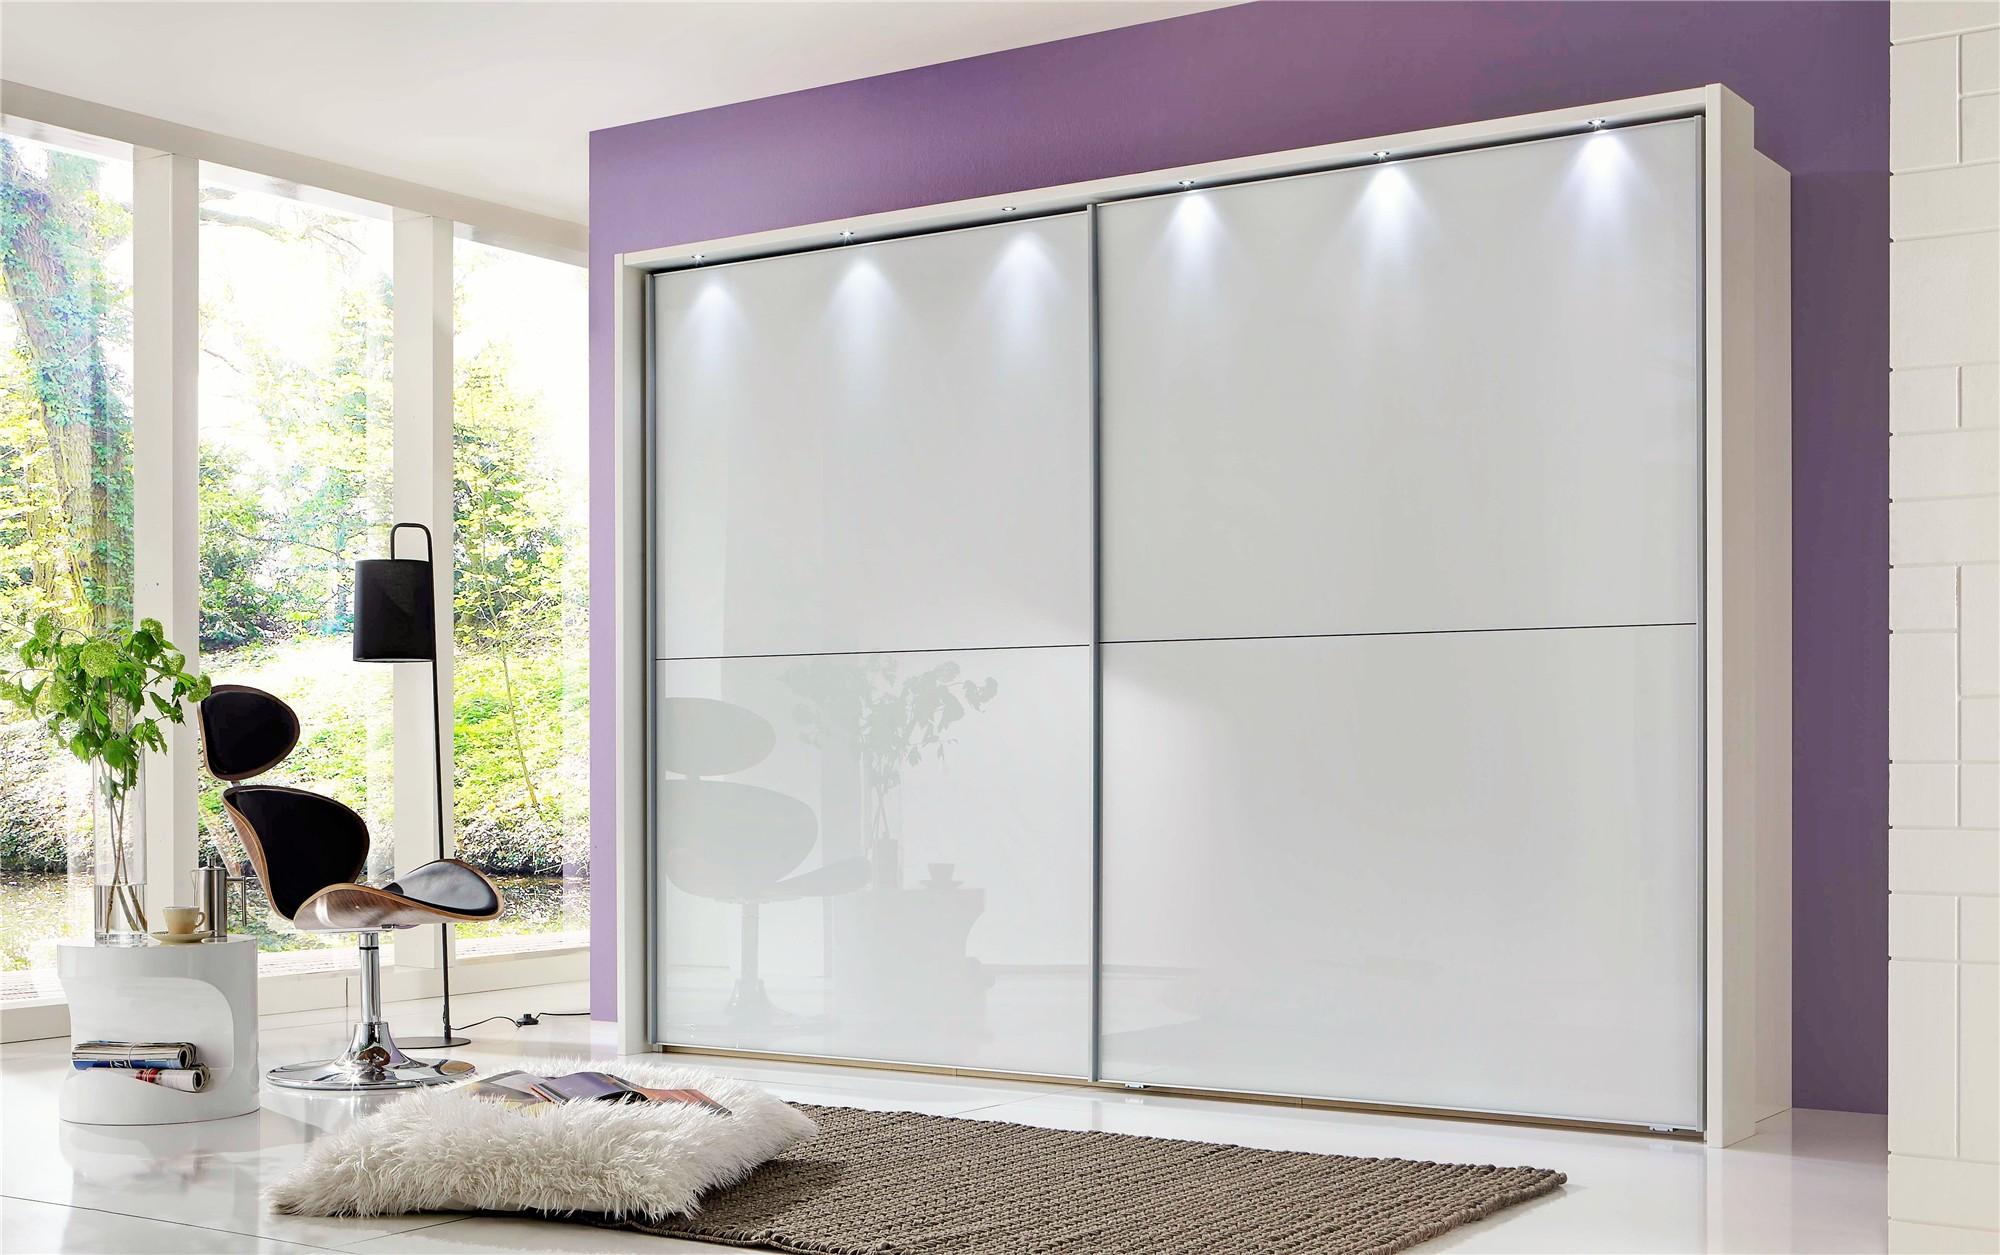 Stylform Linus 150 300cm Sliding Glass Door Wardrobe Head2bed Uk